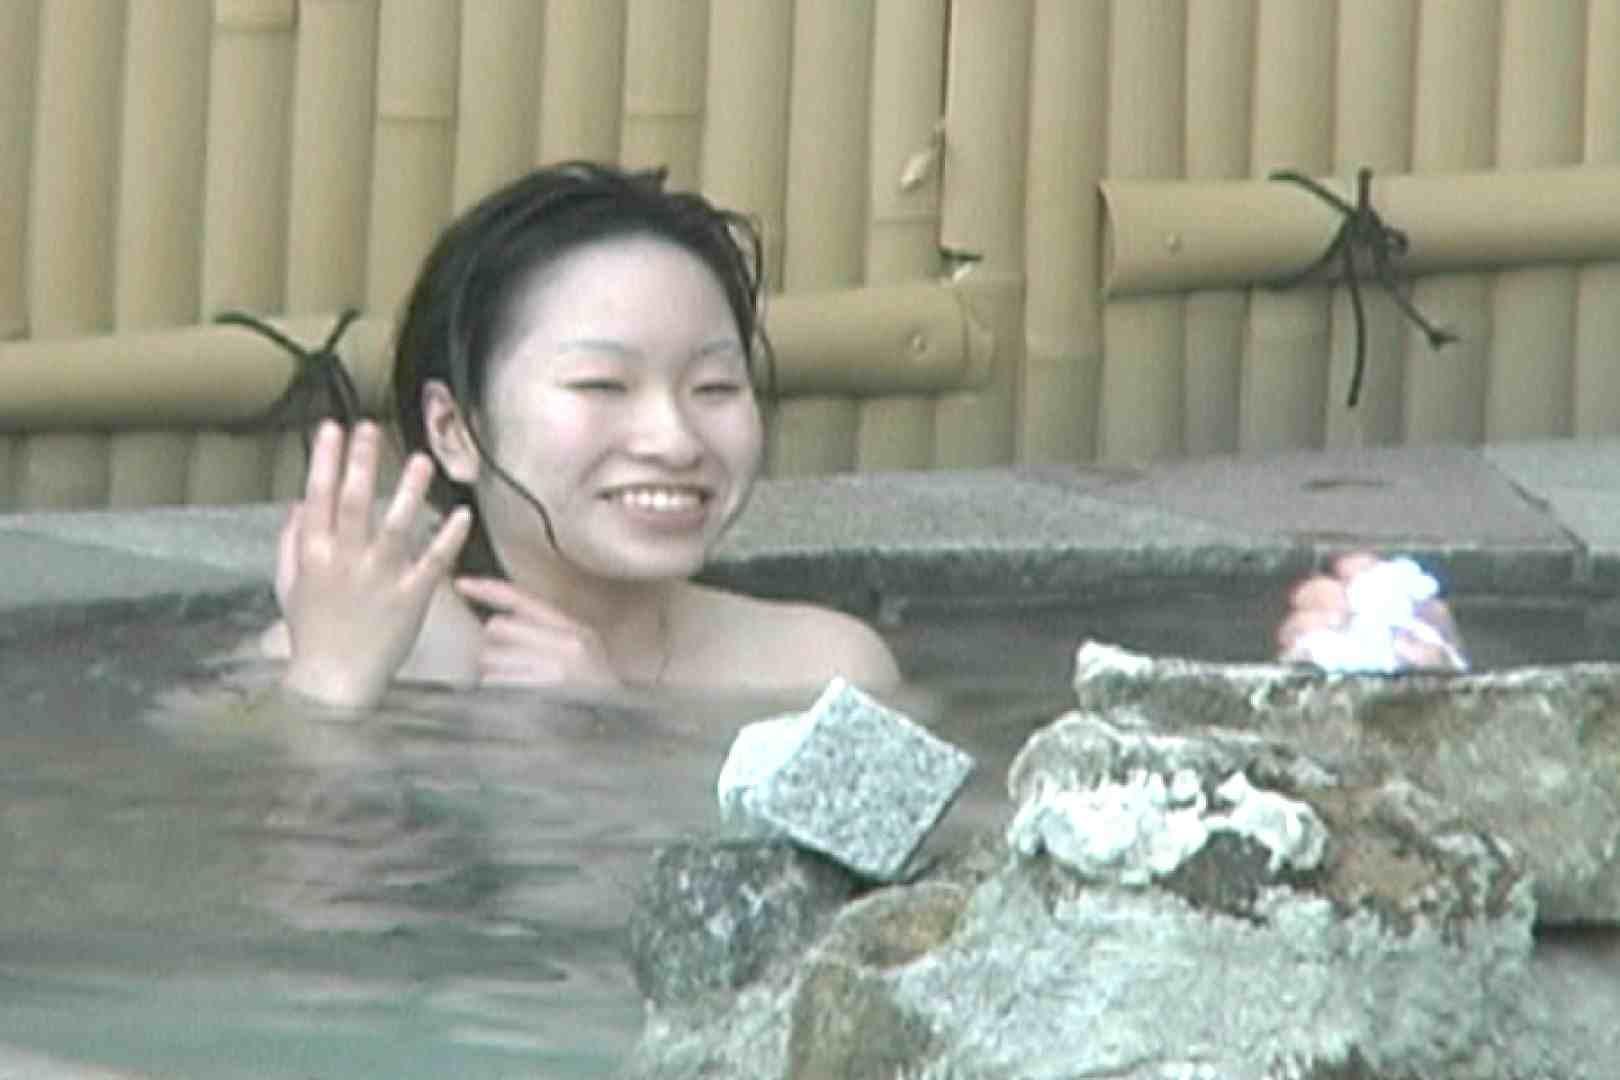 Aquaな露天風呂Vol.595 HなOL | 露天  65pic 51